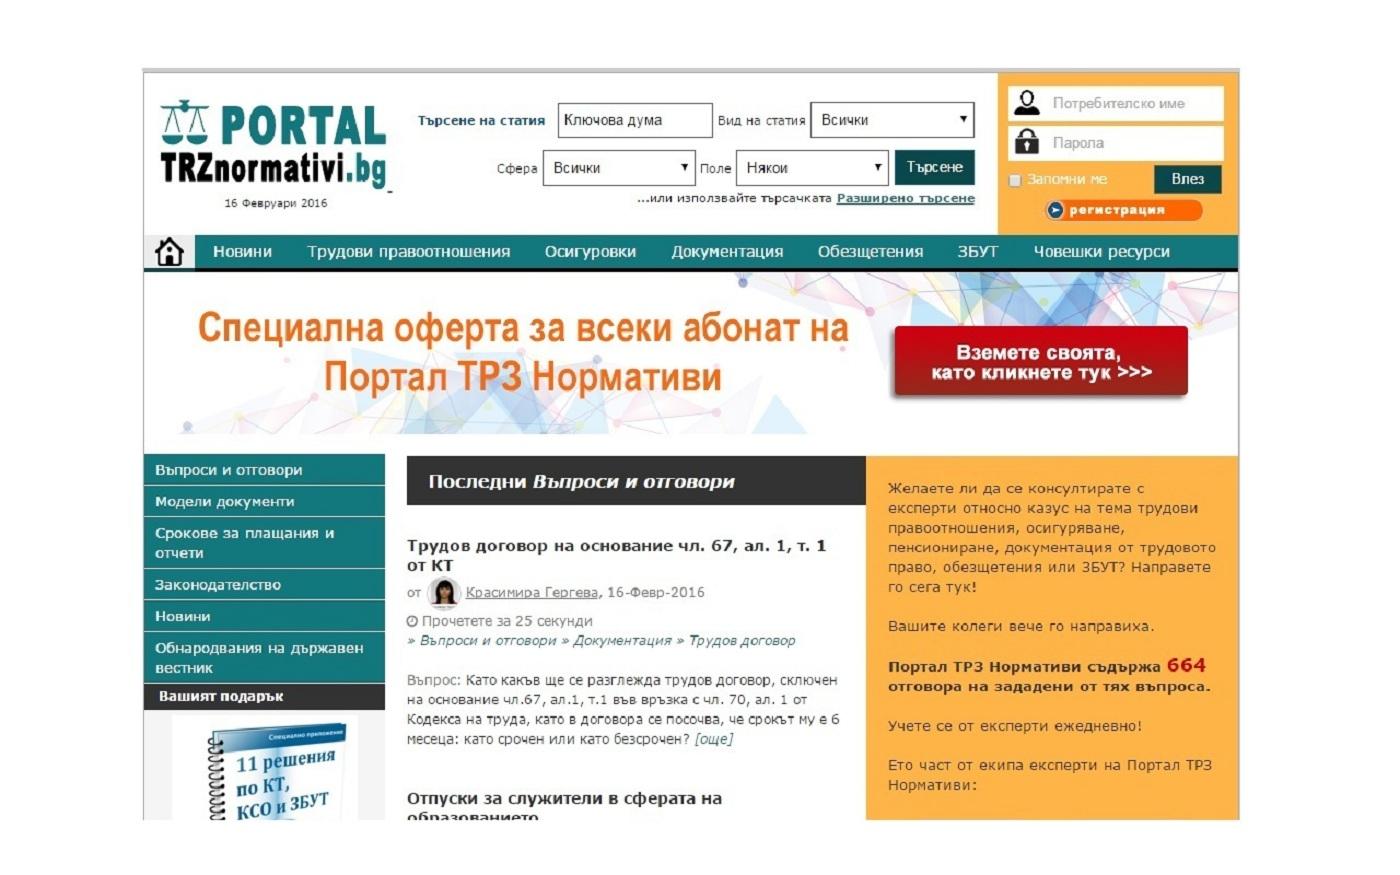 Абонамент за Портал ТРЗ Нормативи 6 месеца